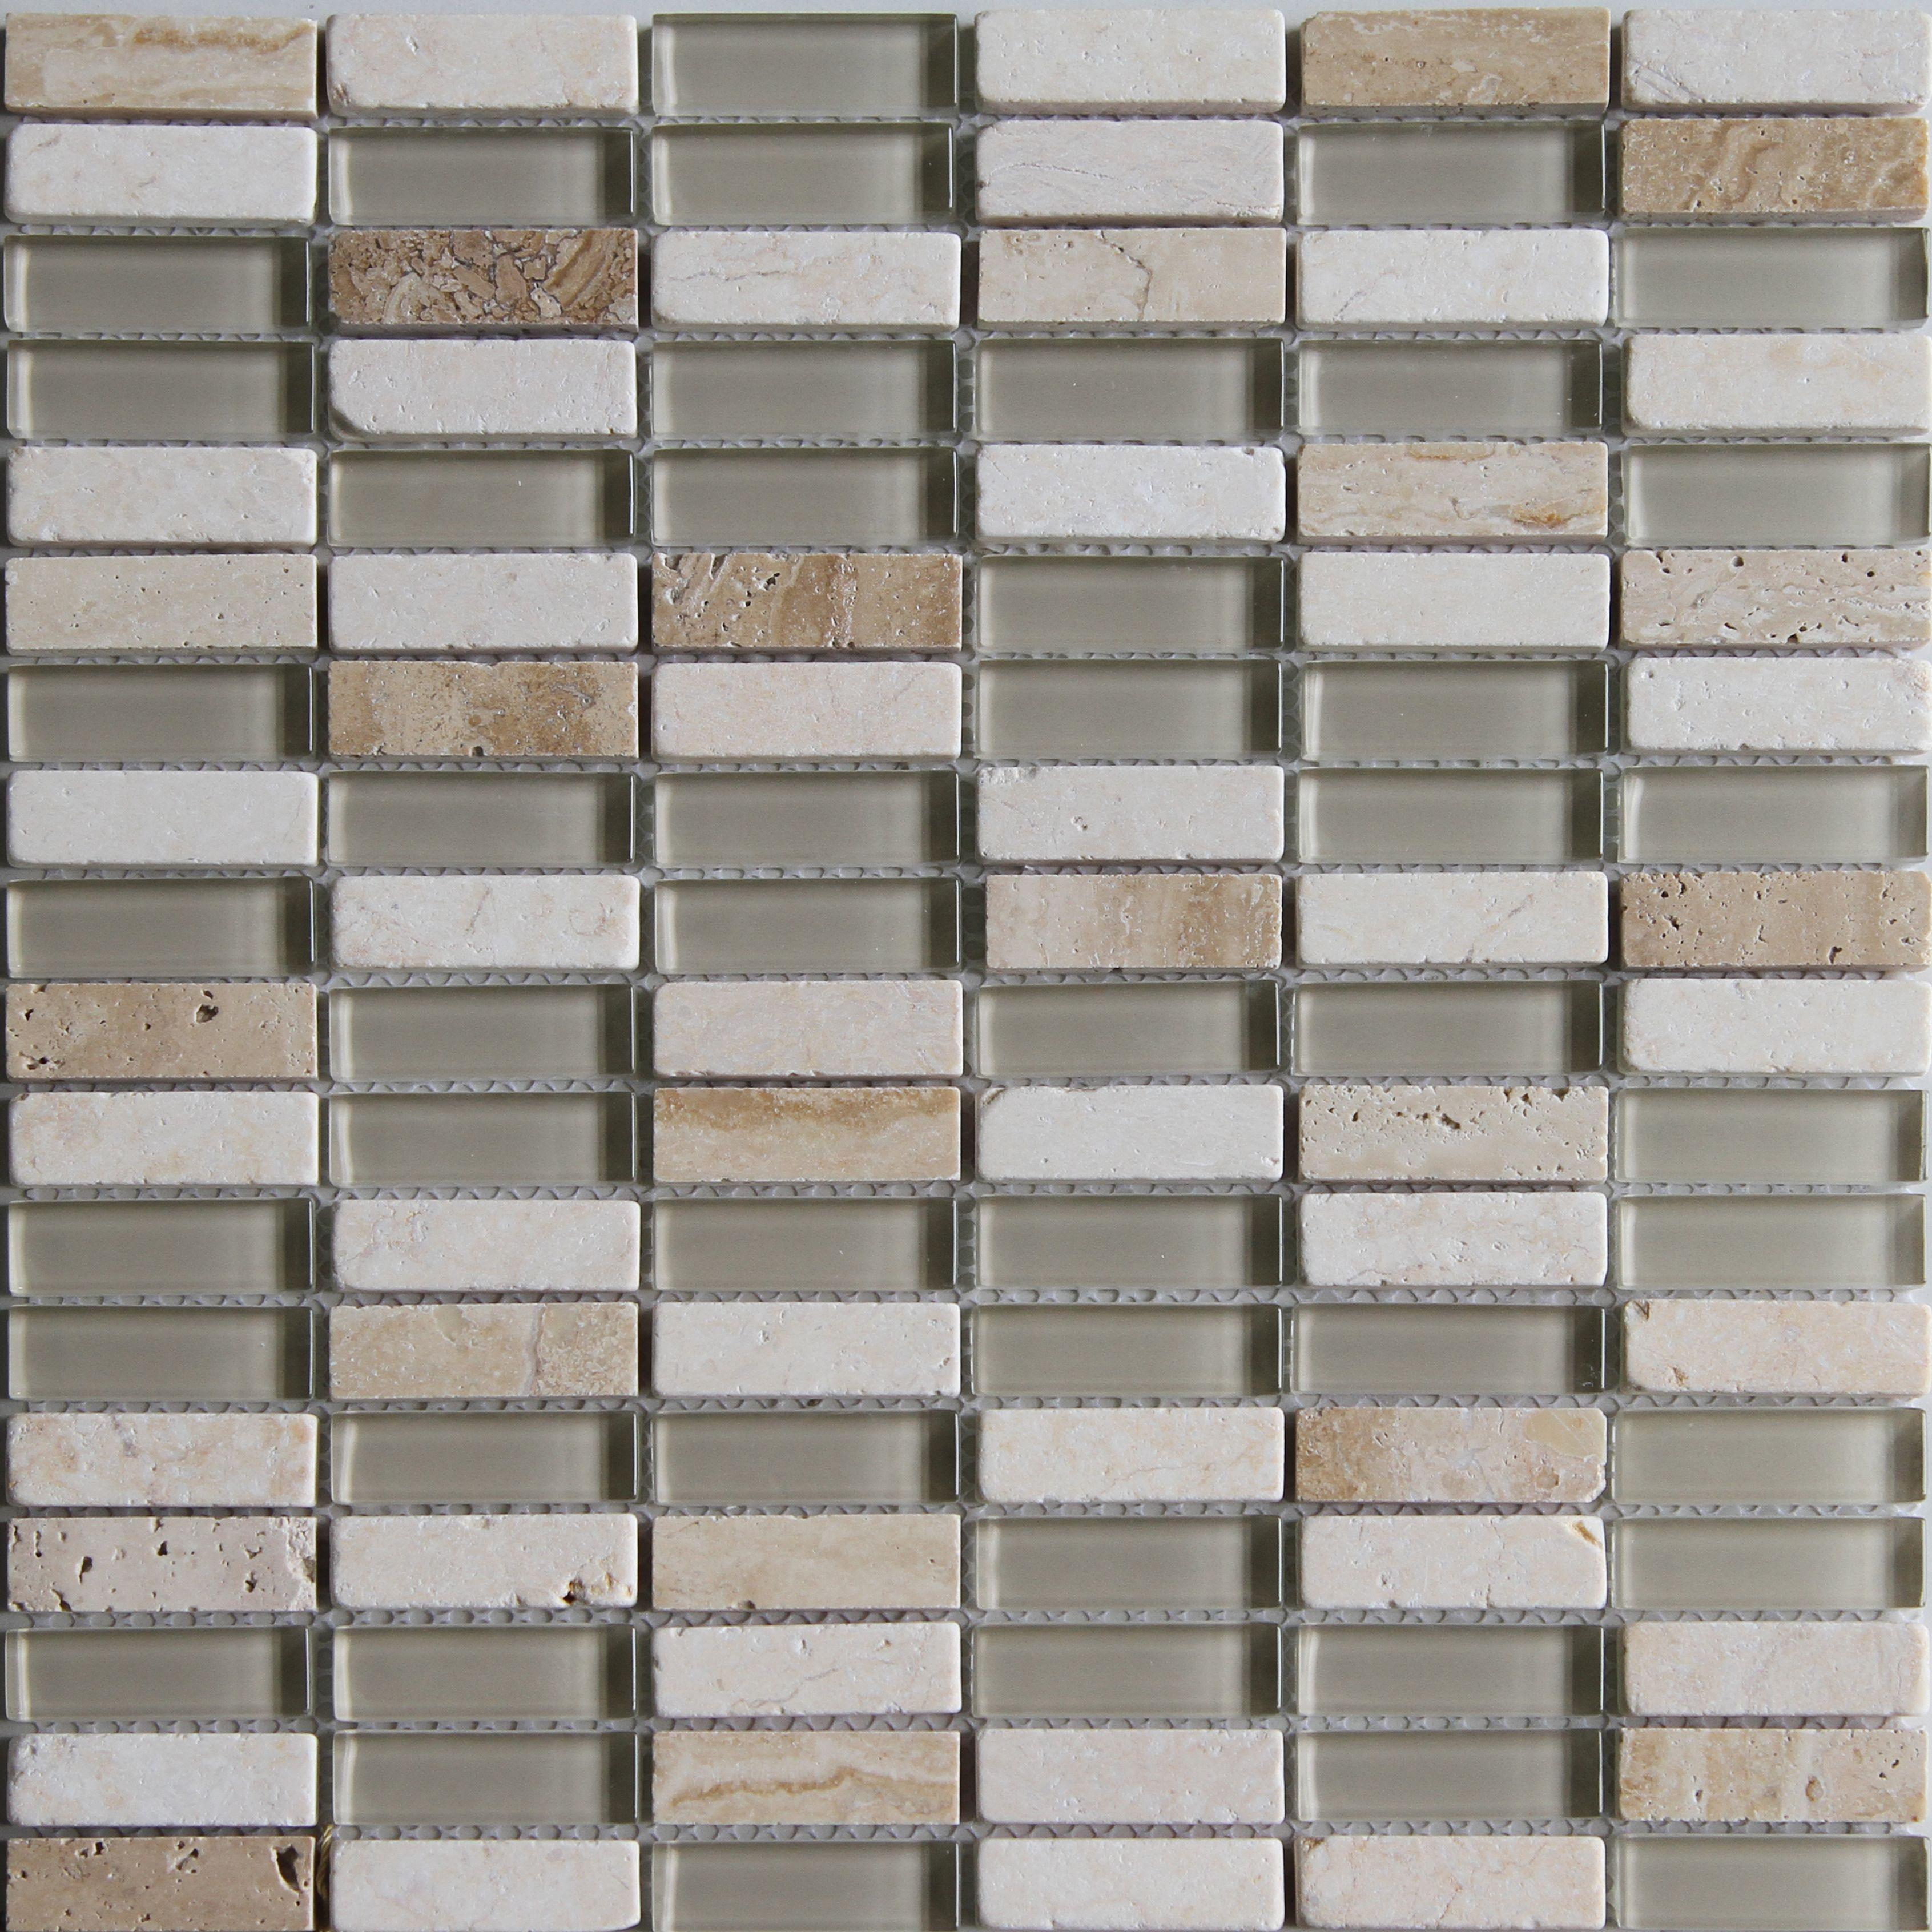 Belluno Beige Glass & Marble Mosaic Tile, (l)304mm (w)298mm